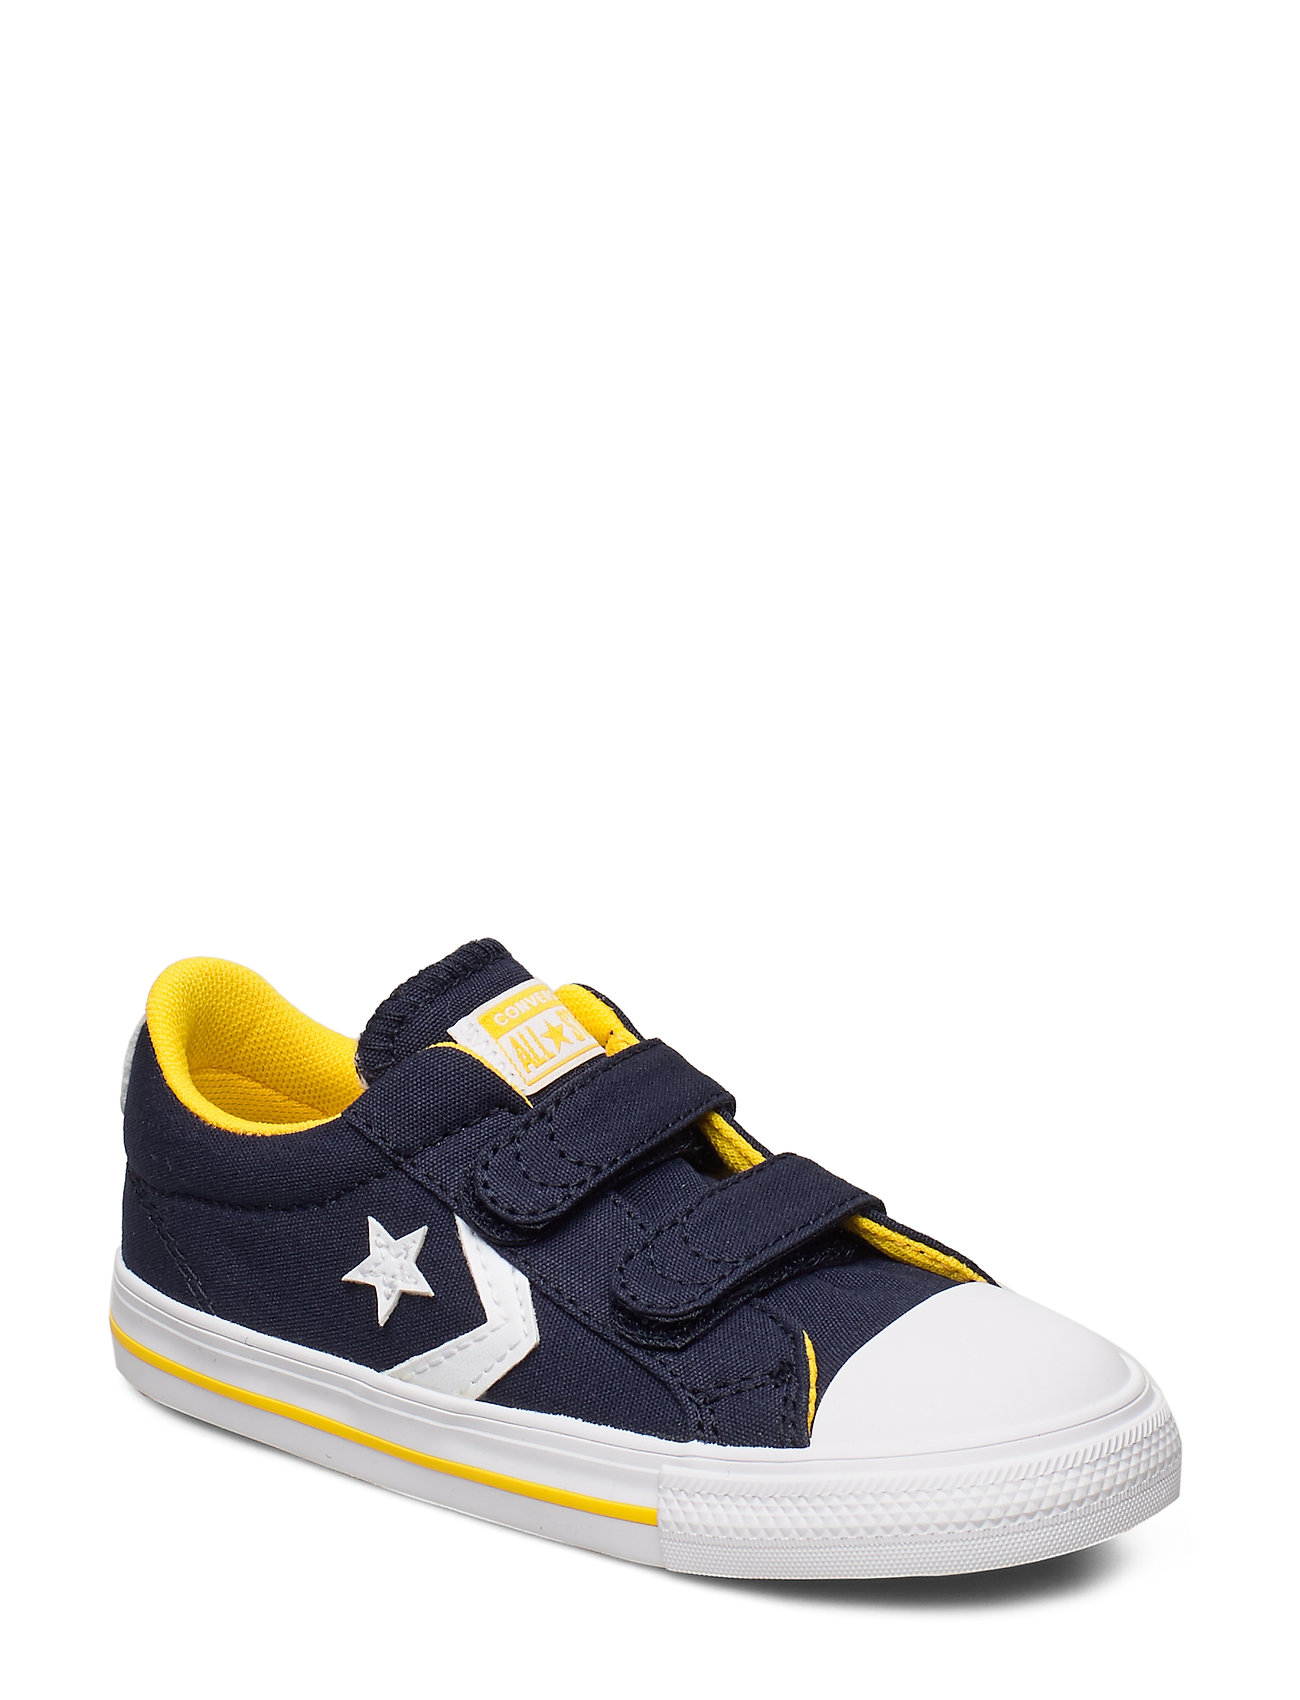 Image of Star Player 2v Ox Sneakers Sko Blå Converse (3452210901)